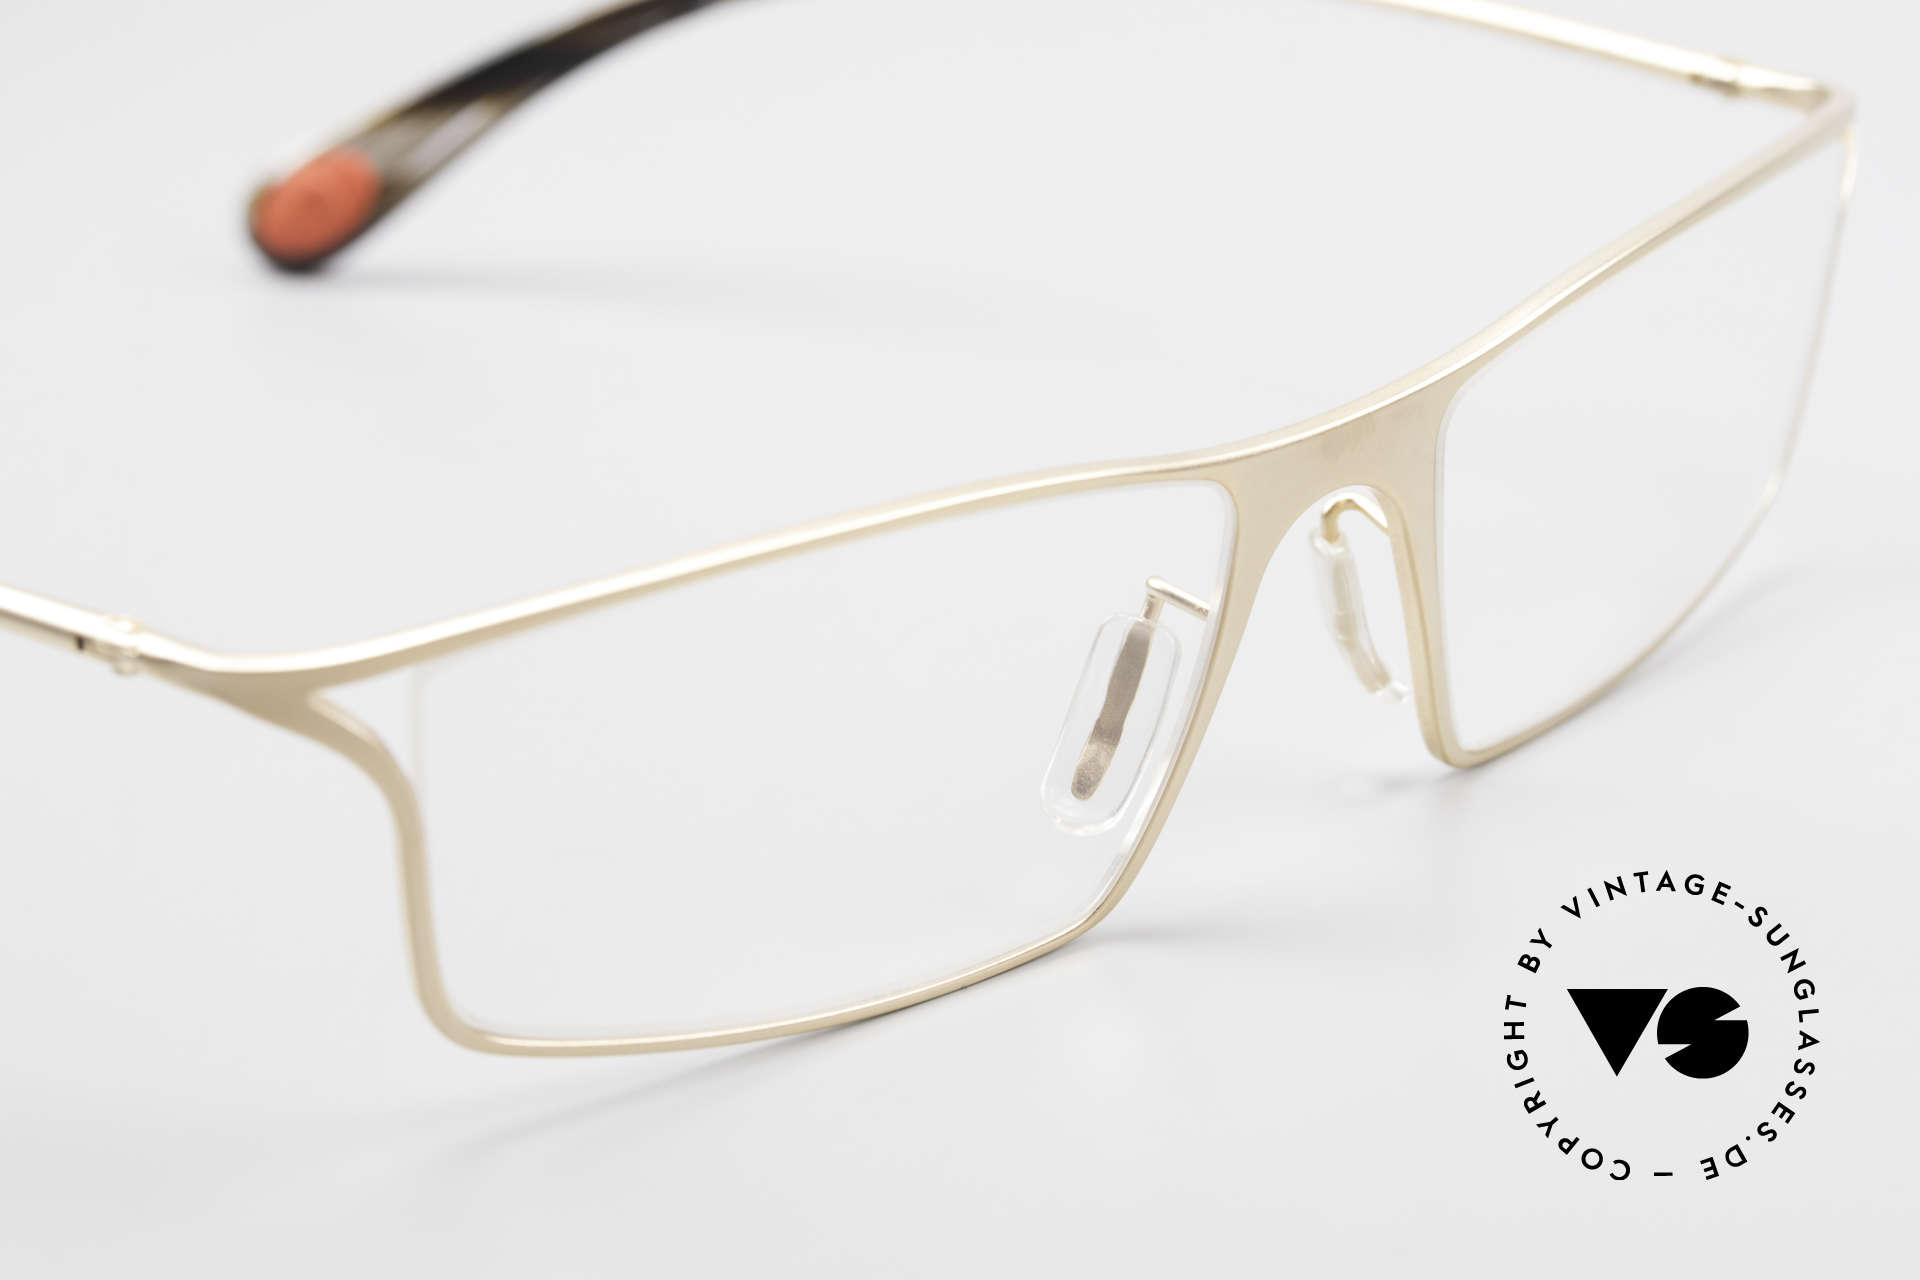 Bugatti 353 Odotype Men's Luxury Eyeglass Frame, Size: large, Made for Men